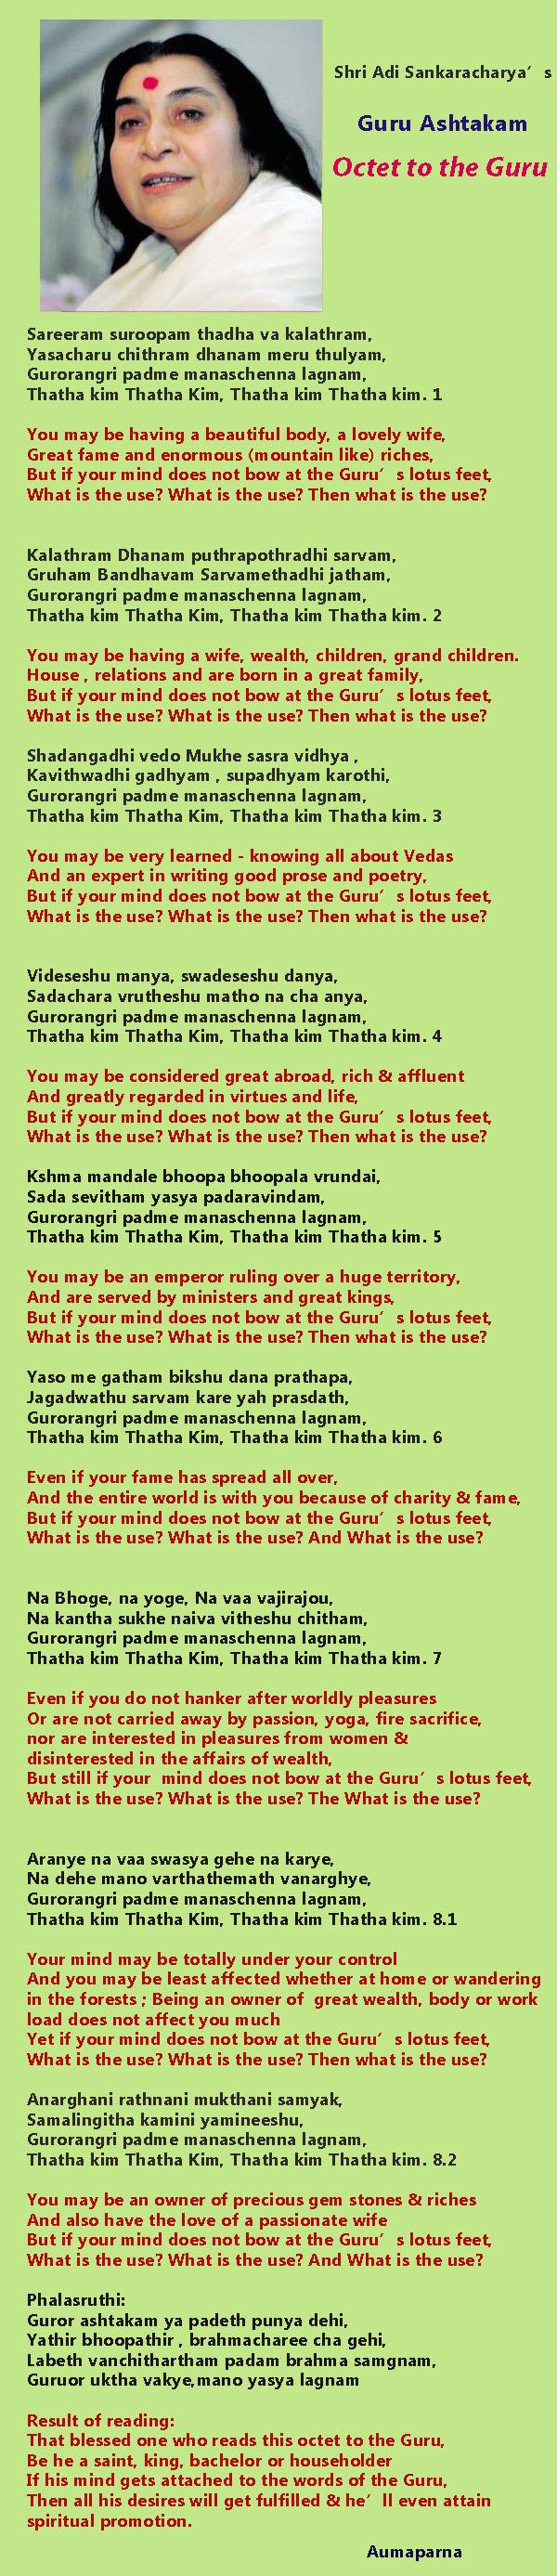 octet-to-guru-aumaparna